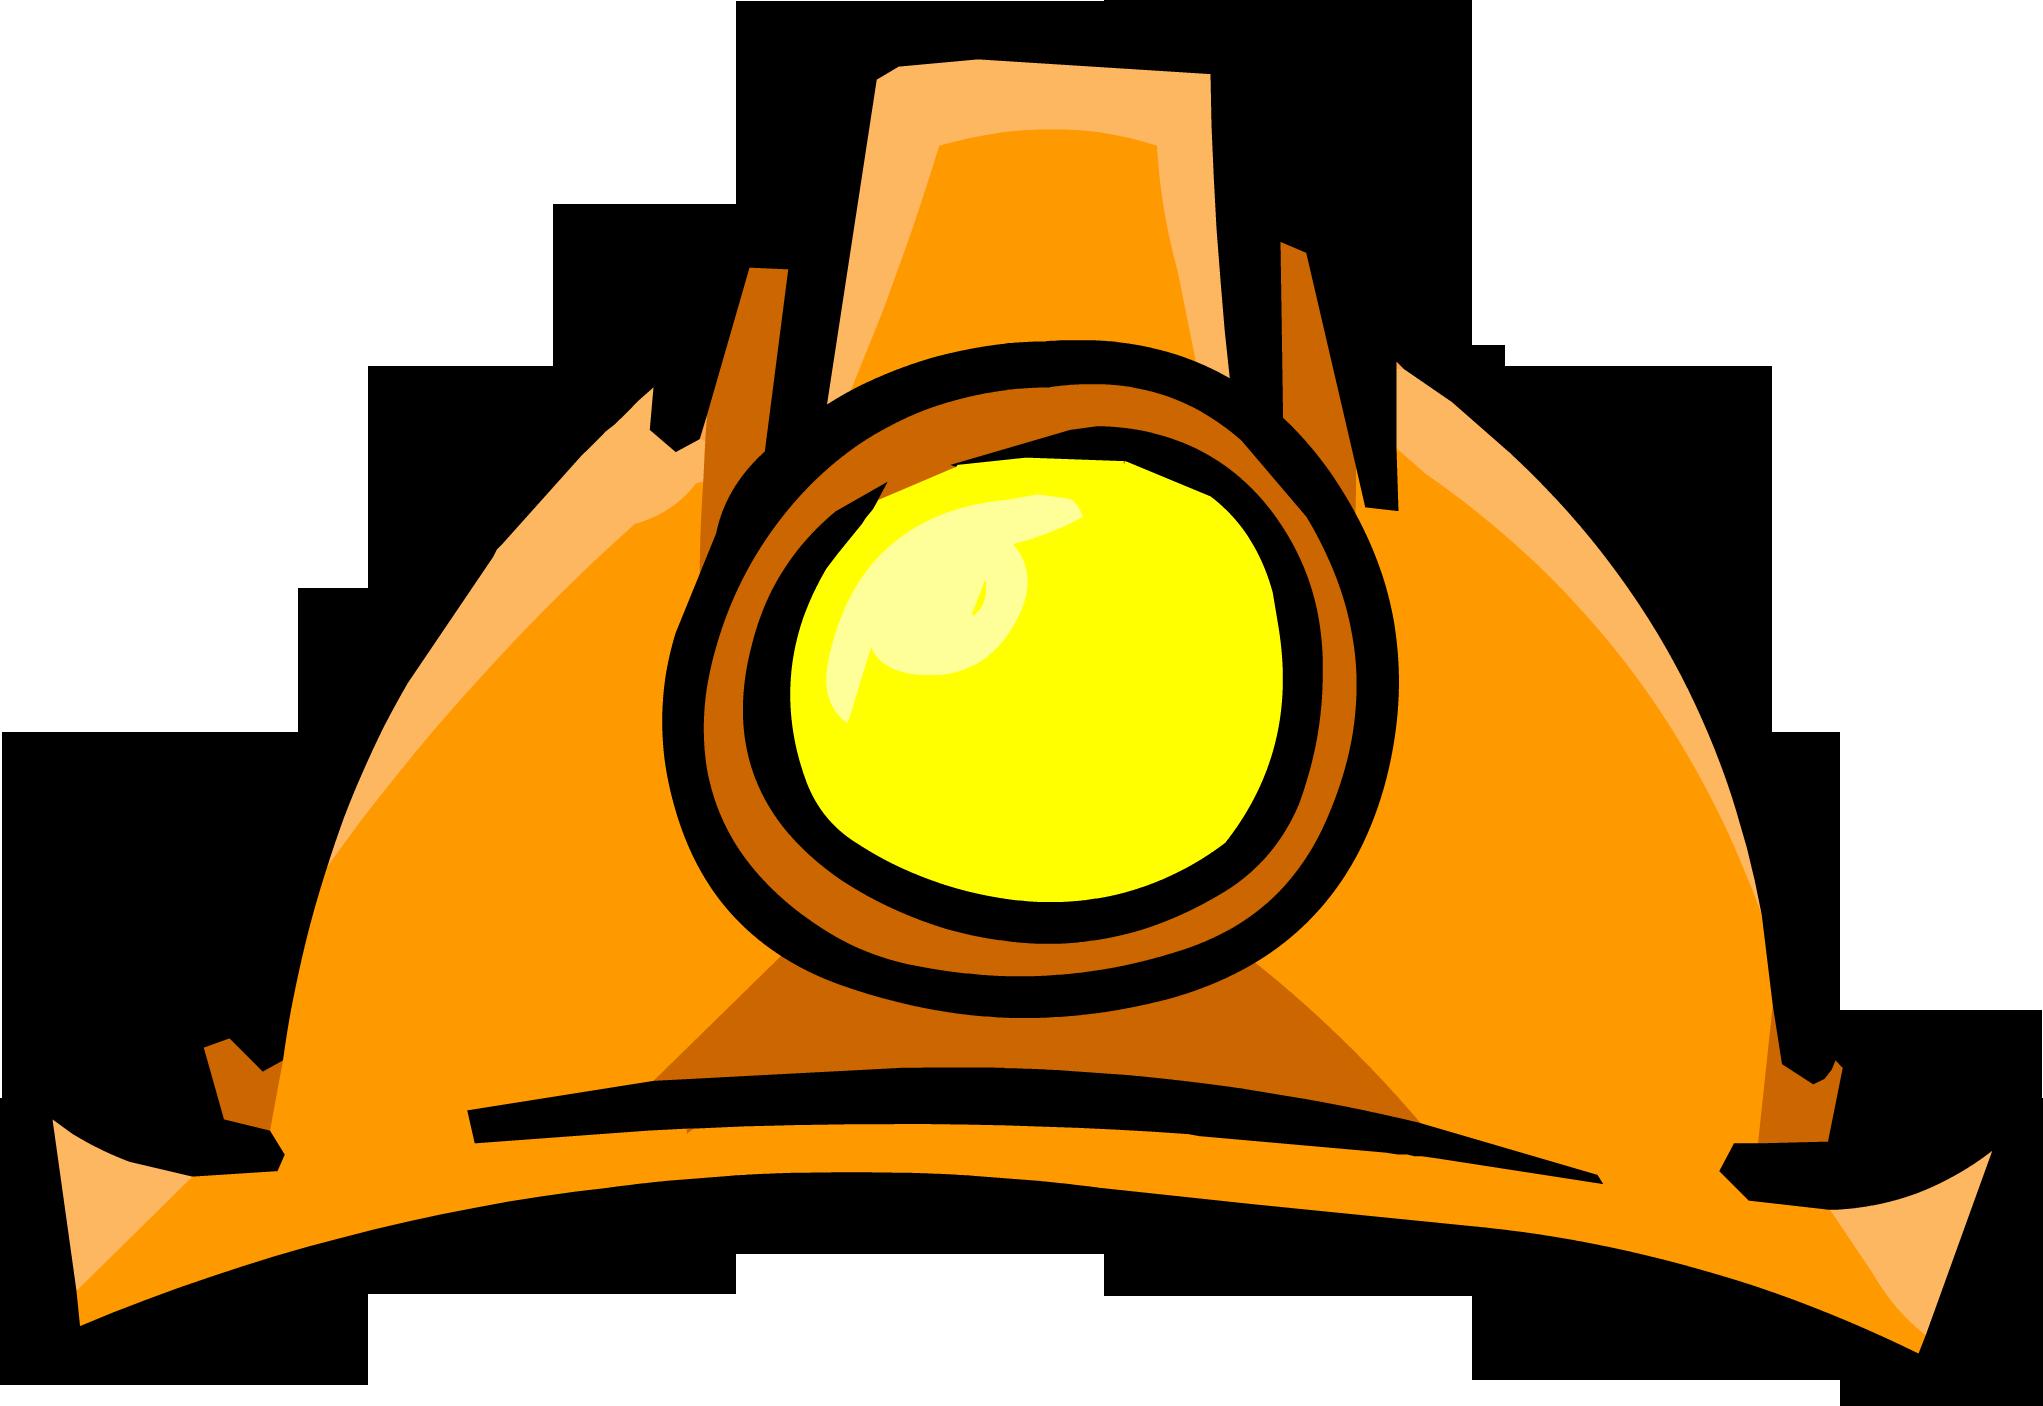 Helmet clipart miner, Helmet miner Transparent FREE for.